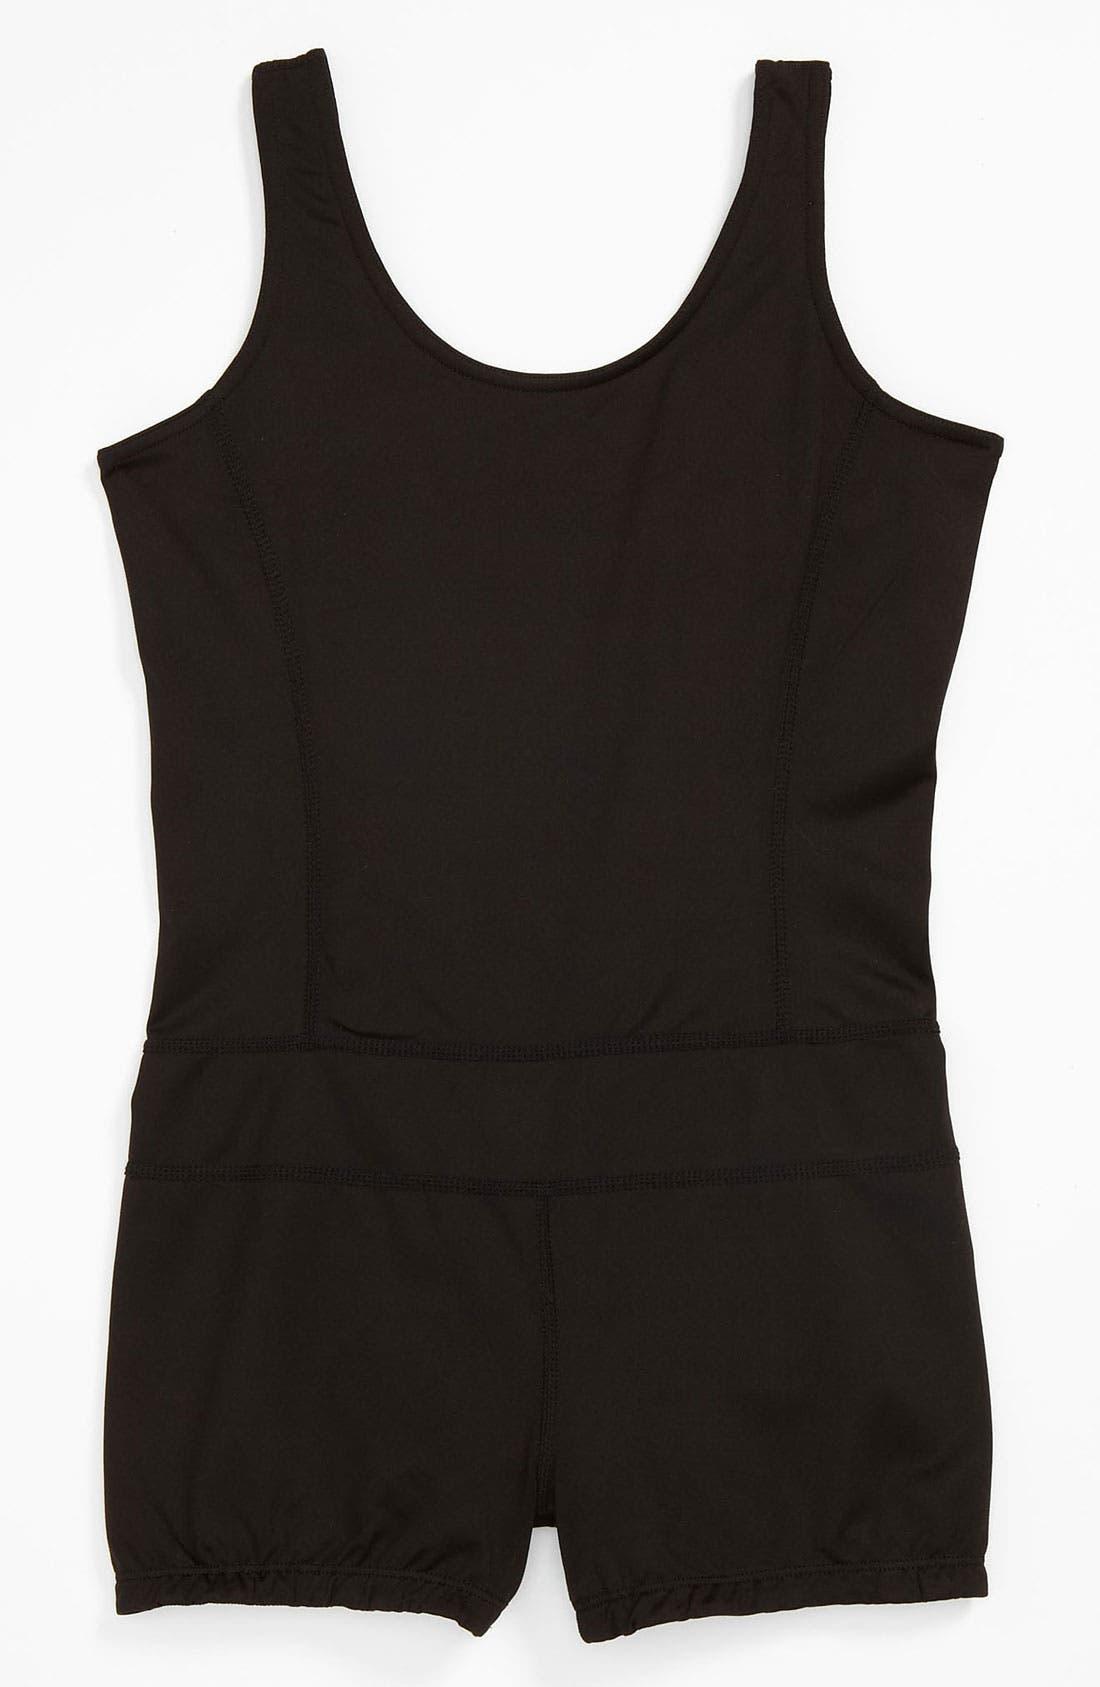 Alternate Image 1 Selected - Limeapple Gym Short Suit (Little Girls & Big Girls)